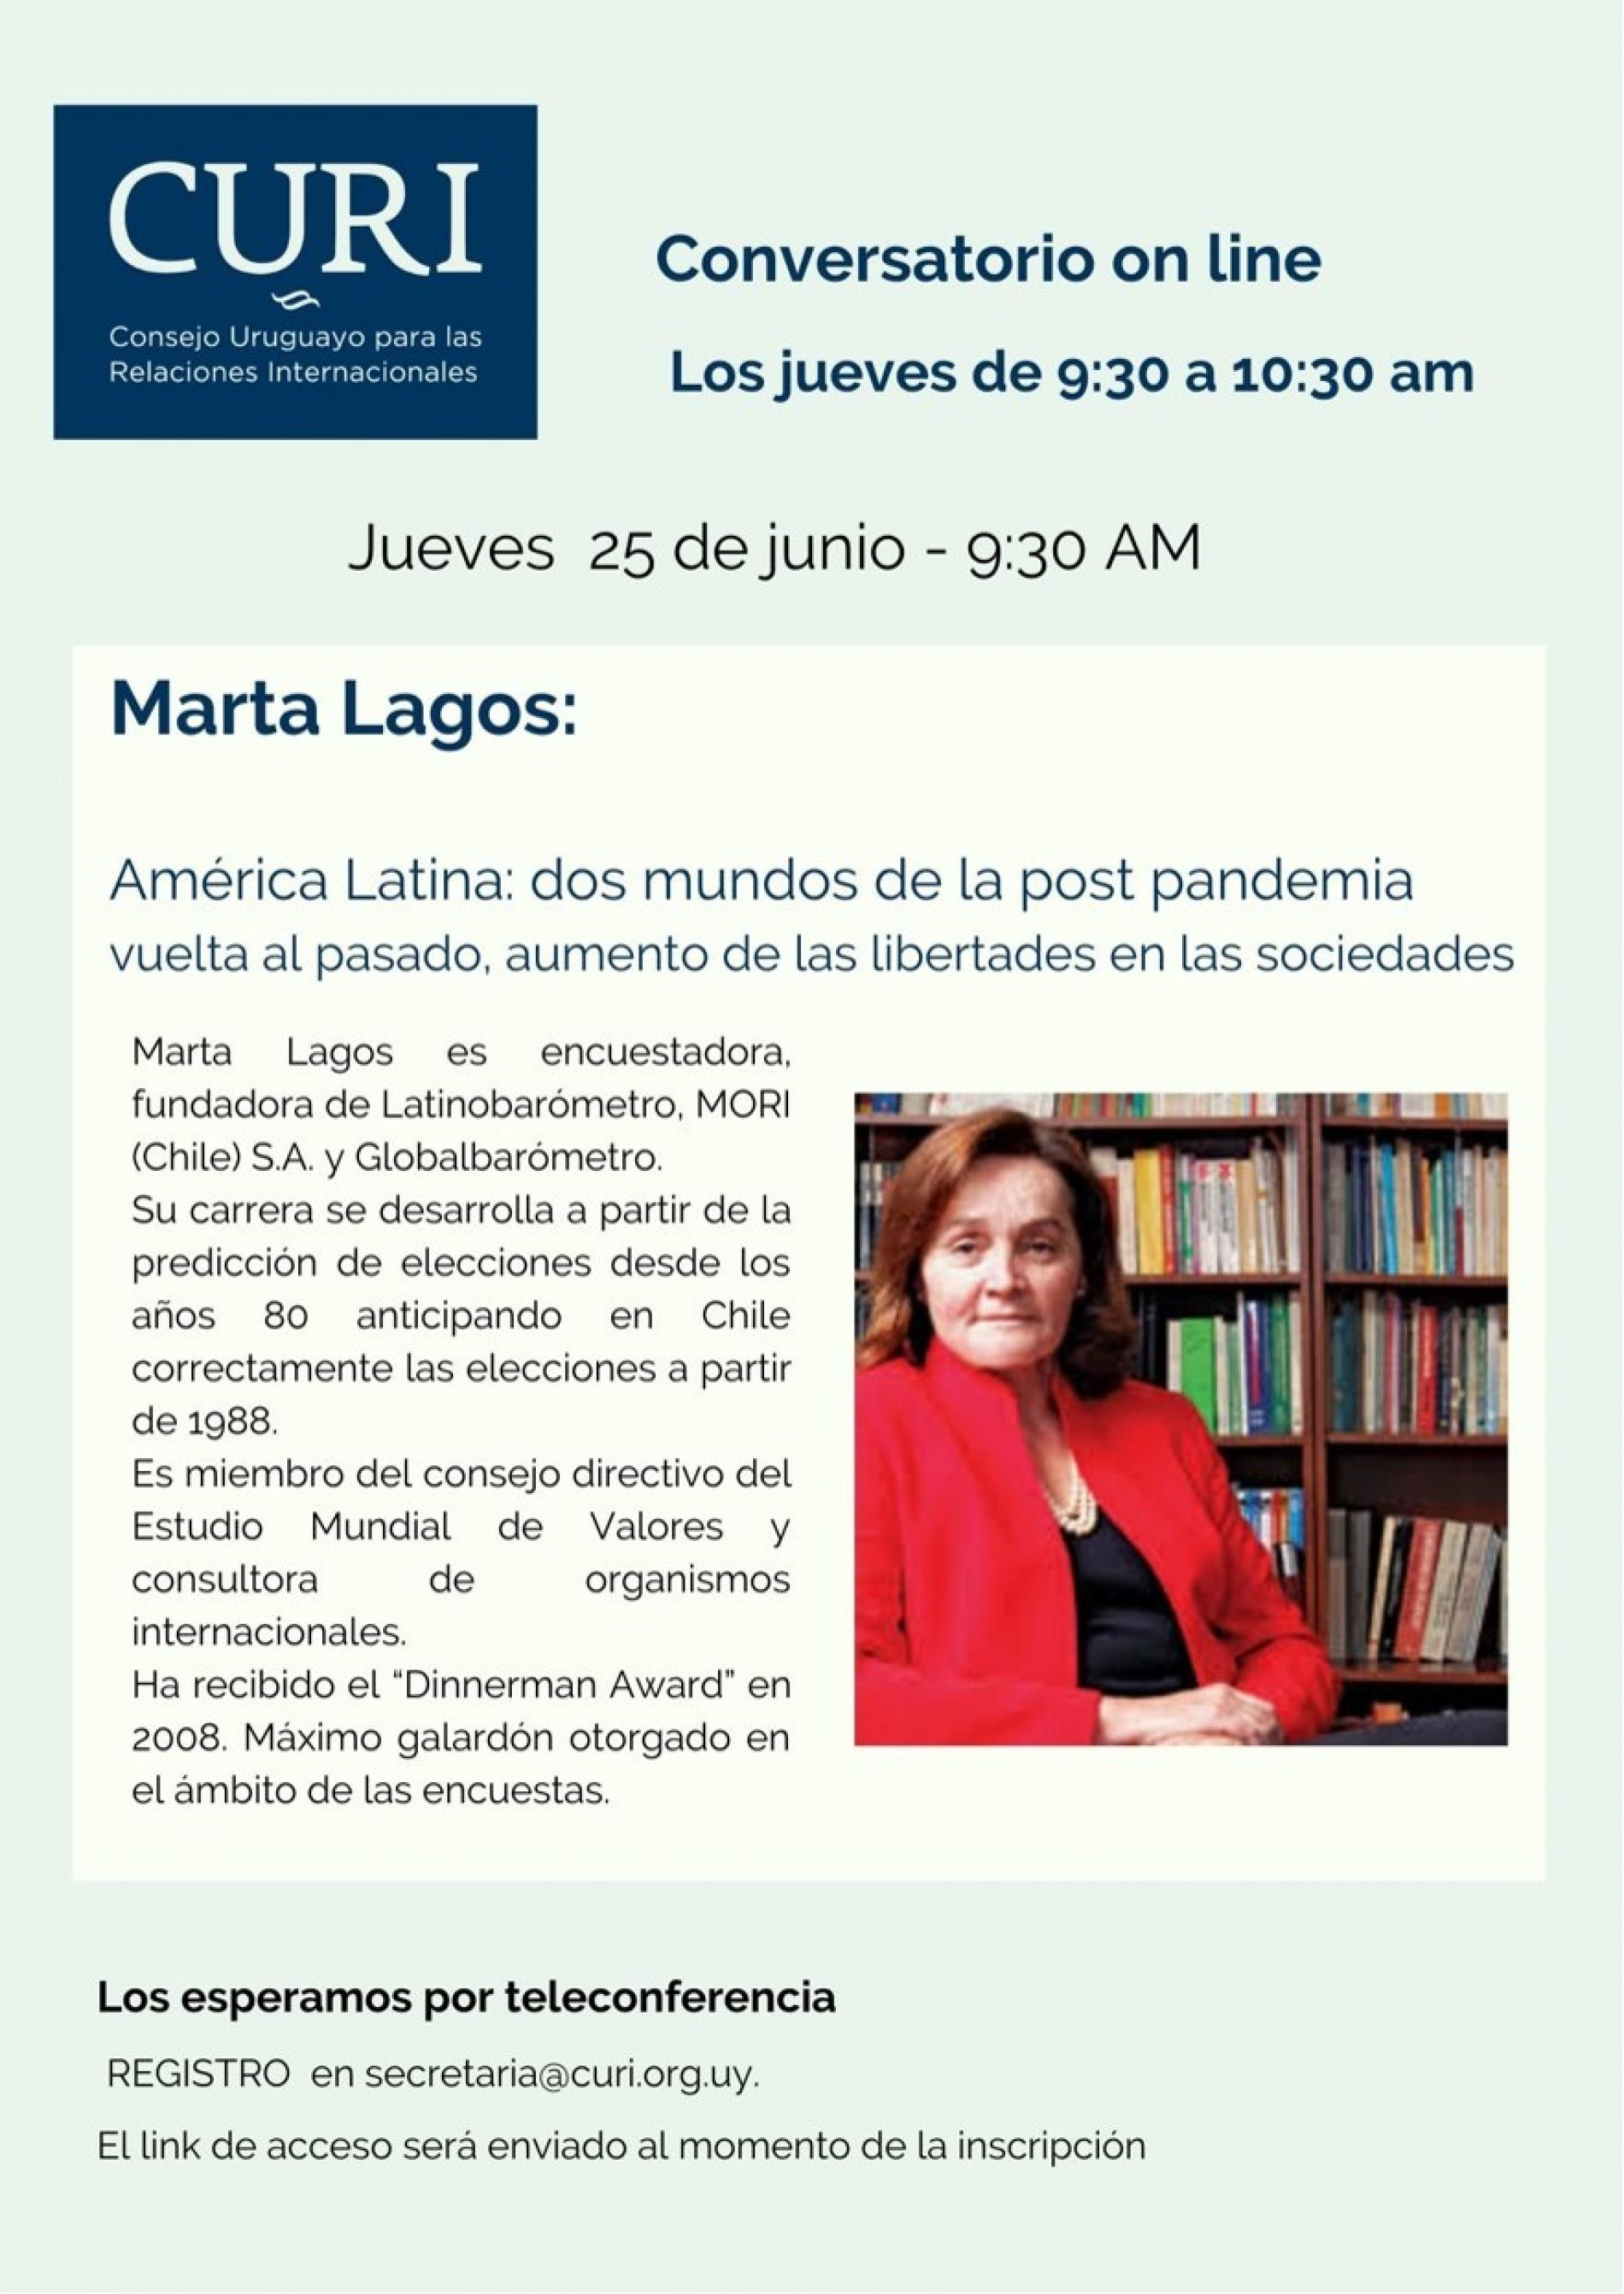 CURI ON LINE con Marta Lagos